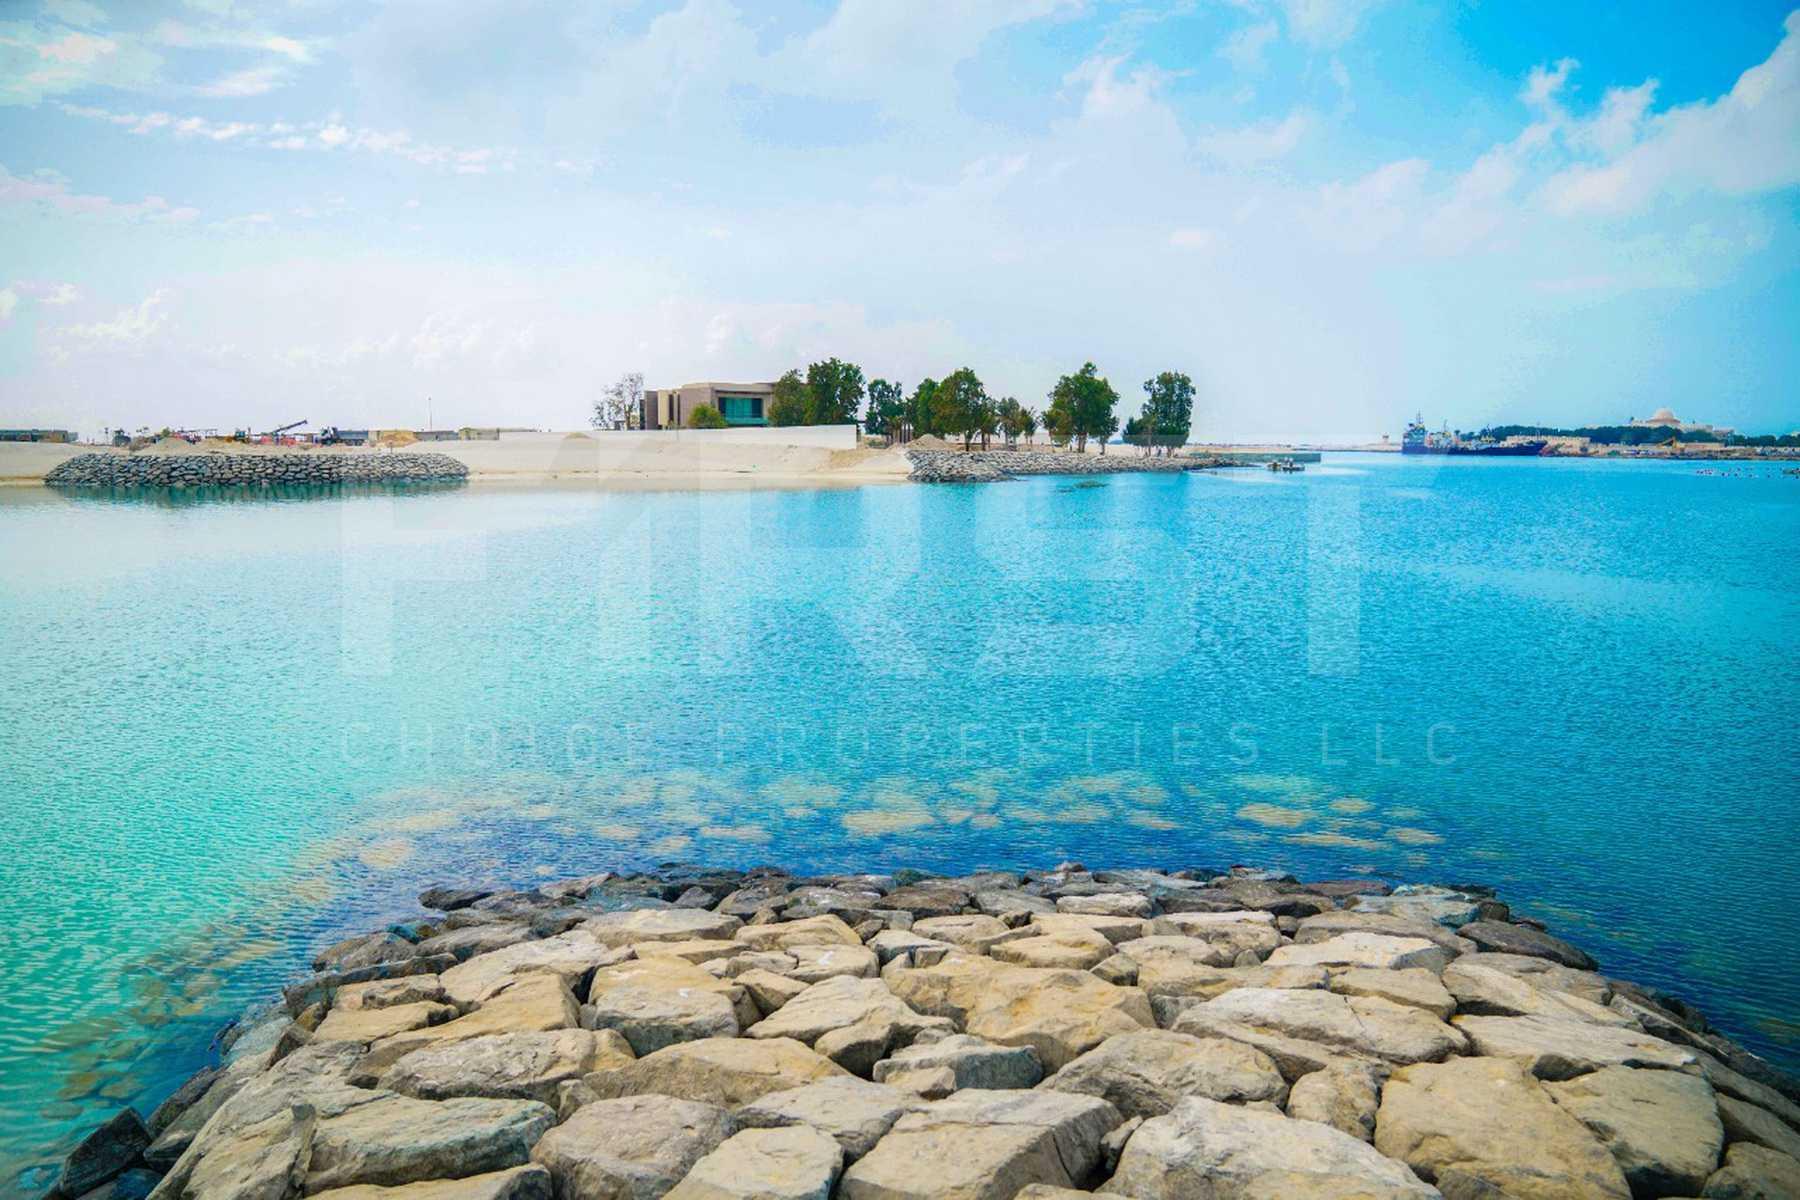 External Photos of NAreel Island Abu Dhabi UAE (5).jpg